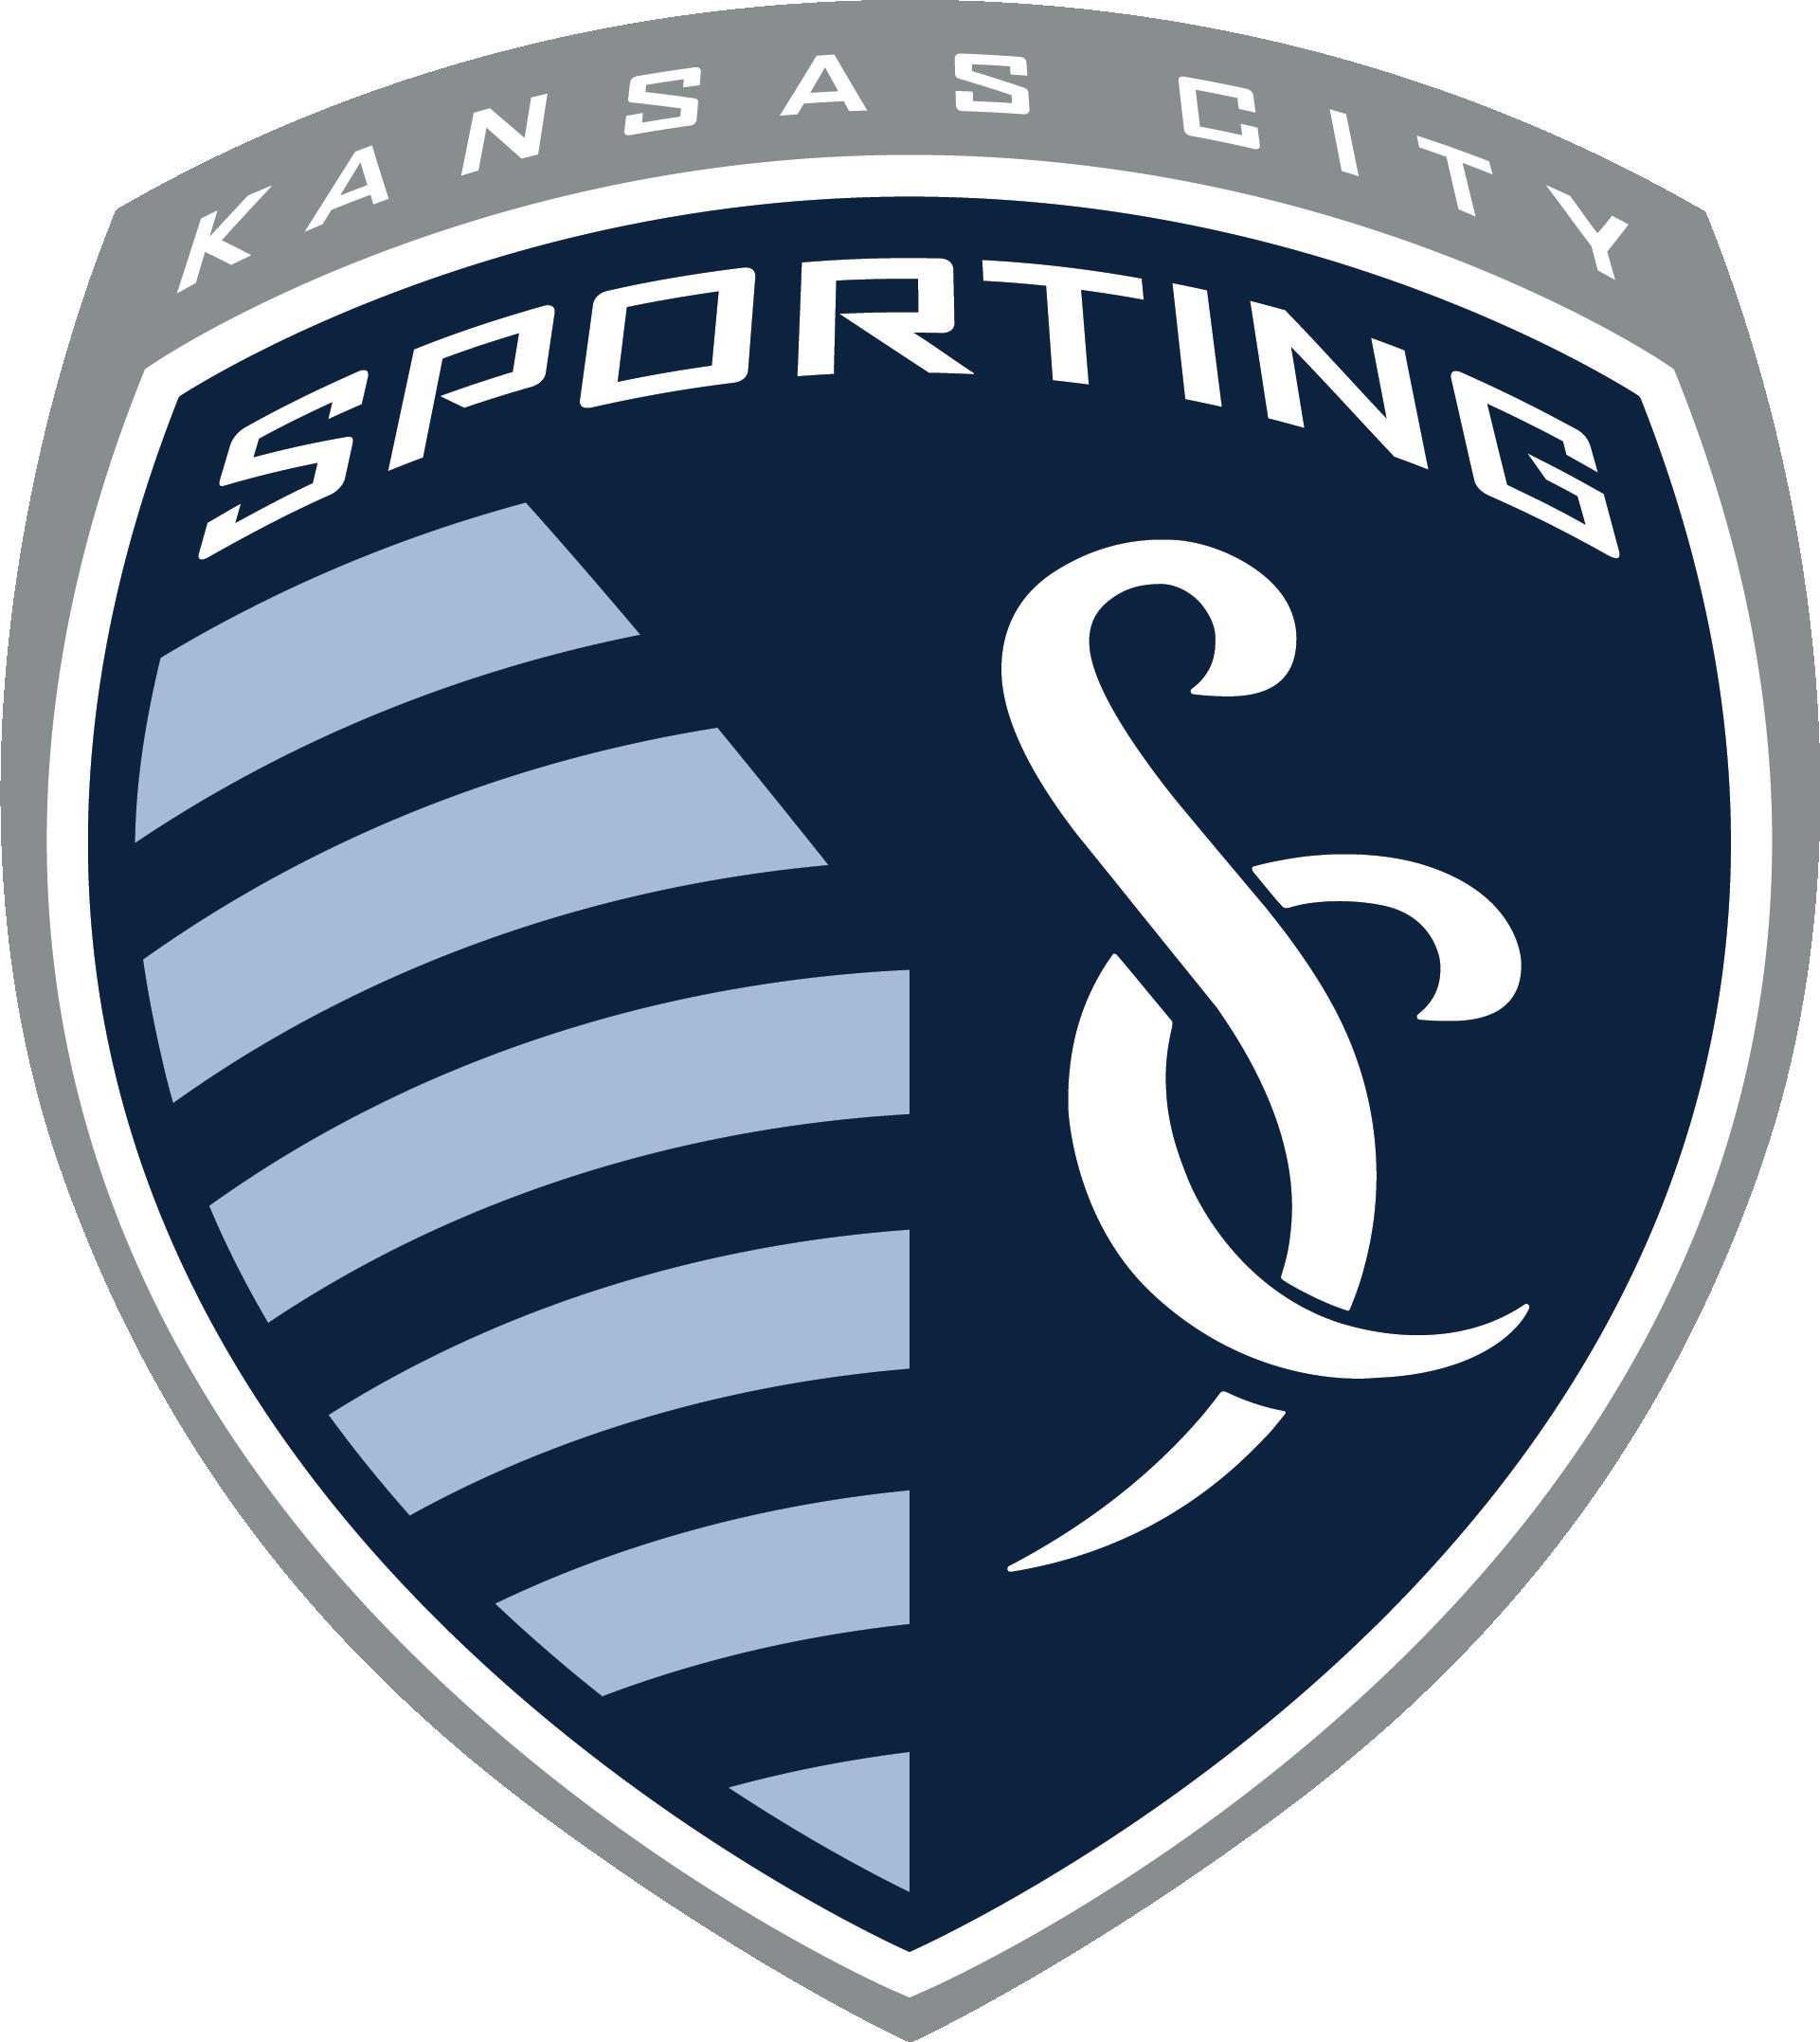 https://www.a-champs.com/blogs/news/a-champs-becomes-official-player-development-partner-of-major-league-soccer-team-sporting-kansas-city